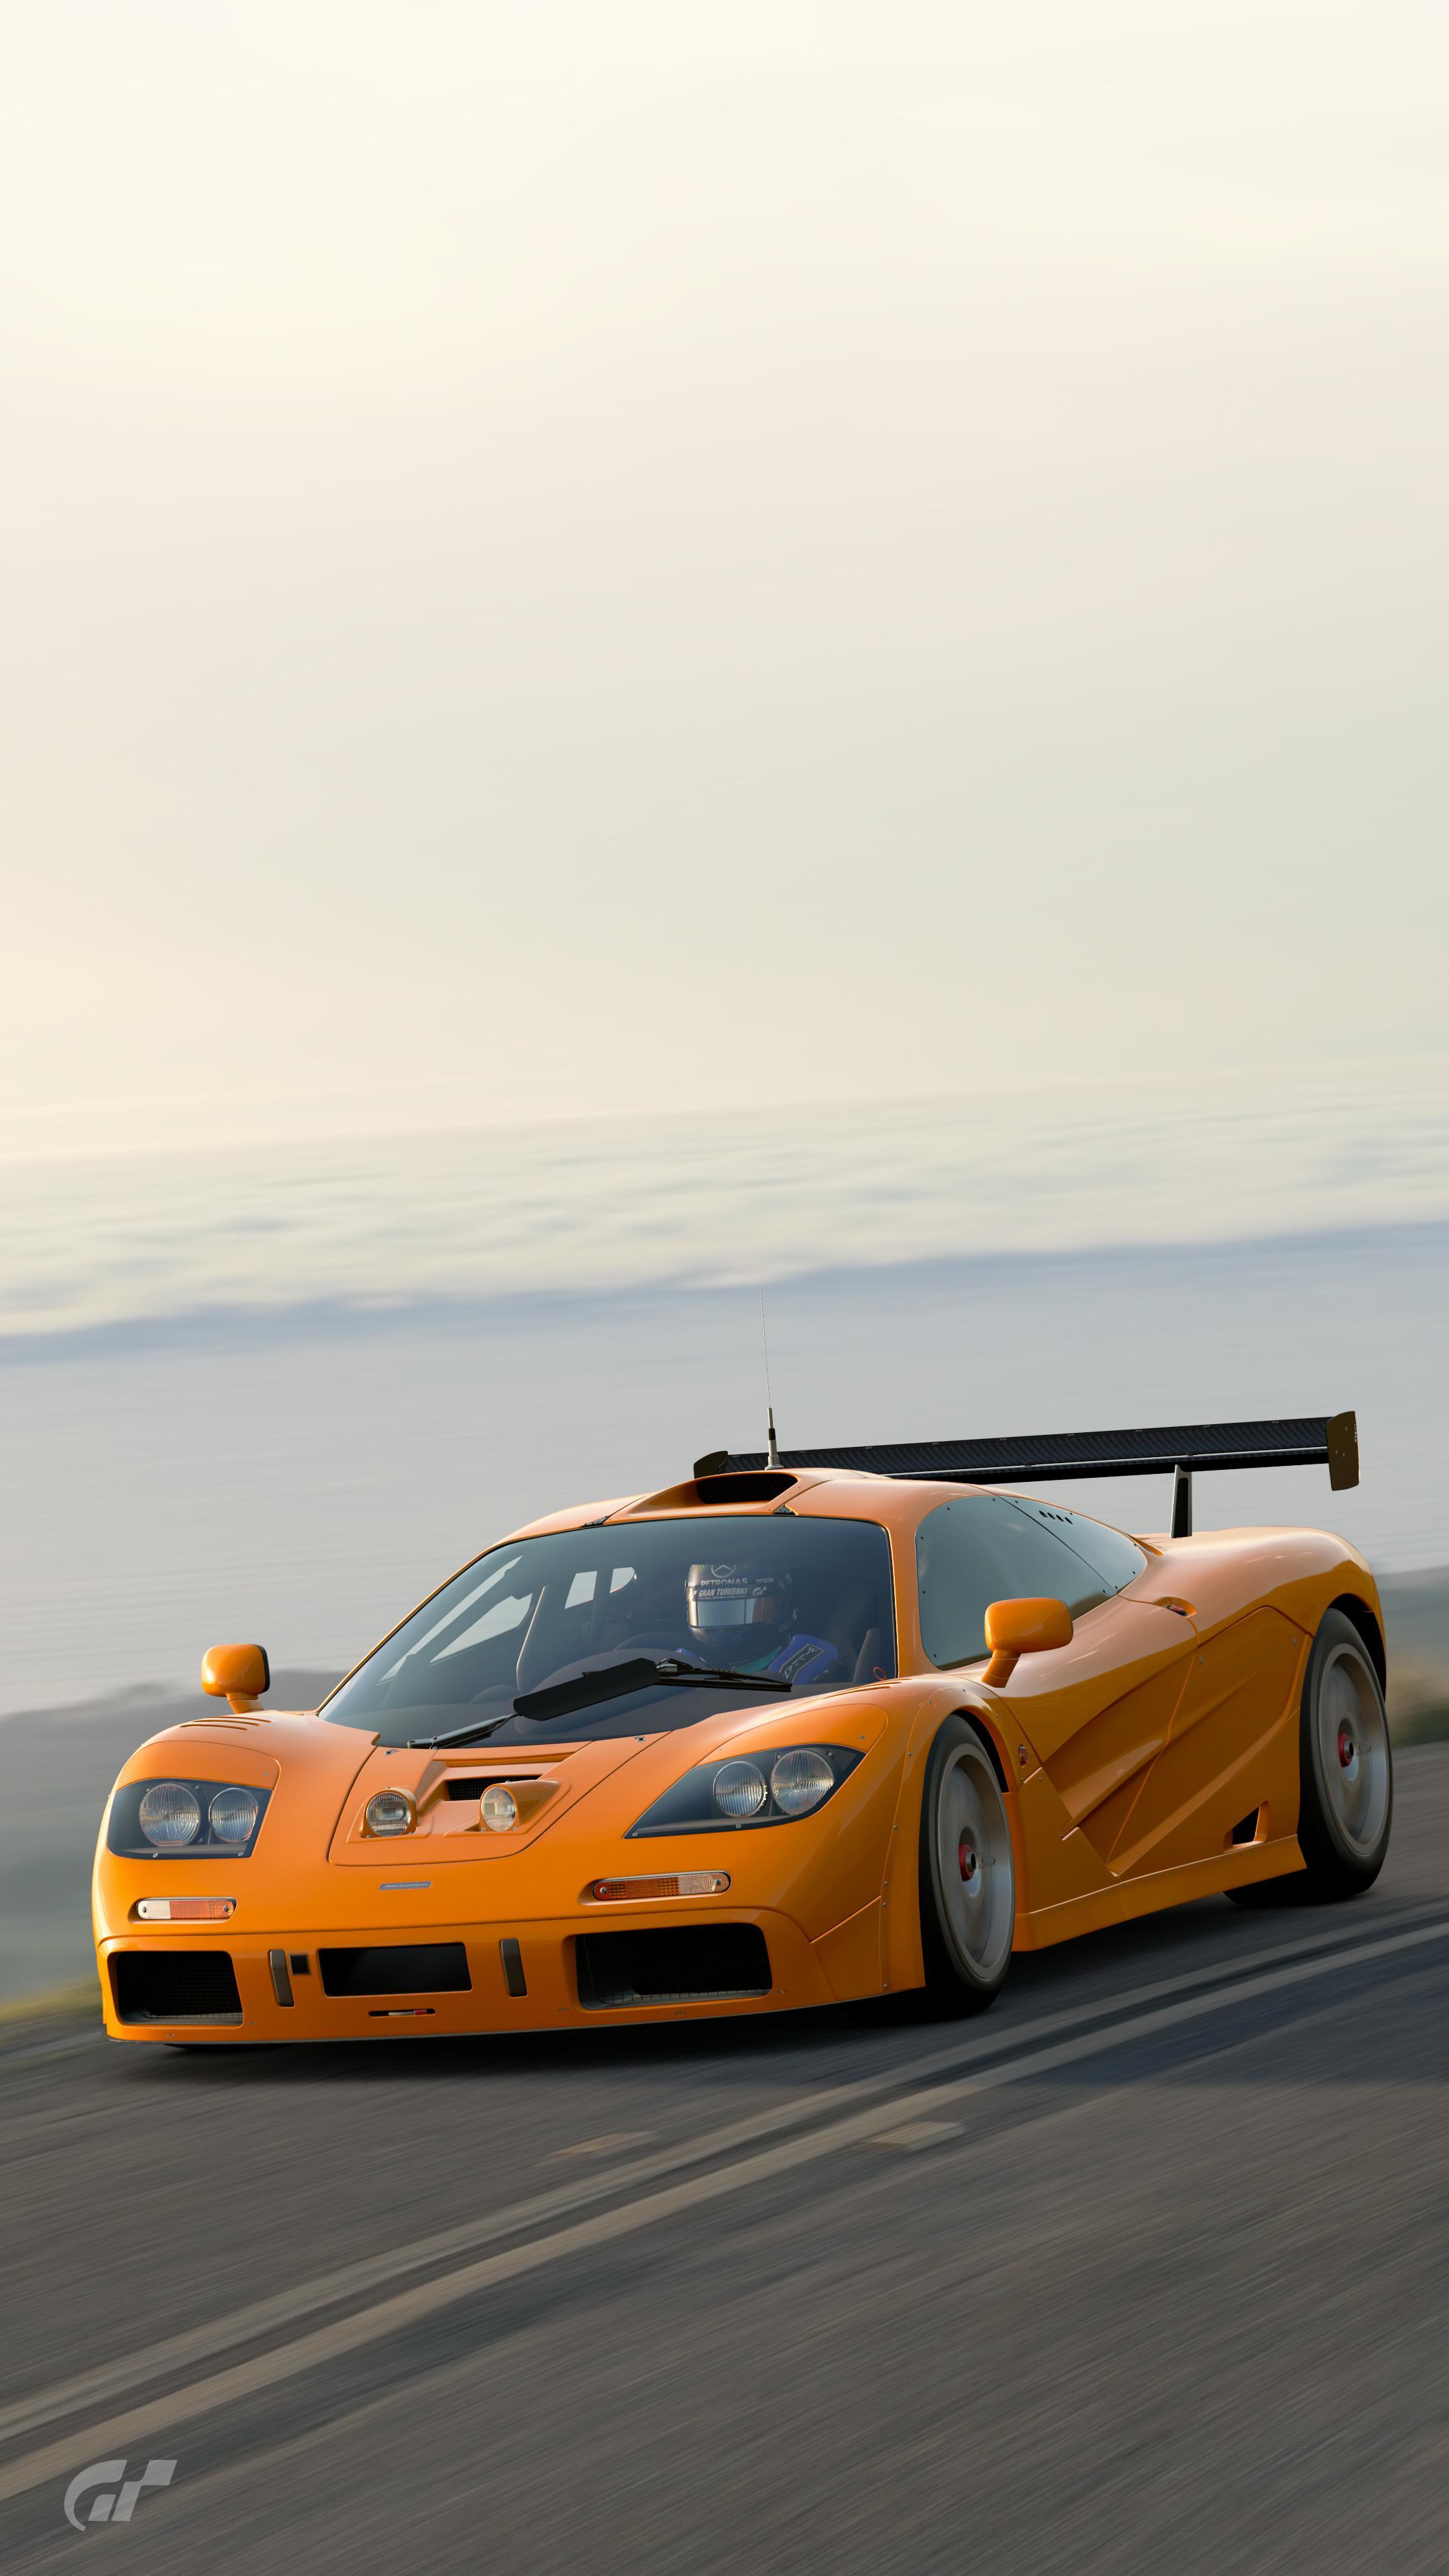 McLaren F1 LM wallpaper for phone hope you like it granturismo 2160x3840